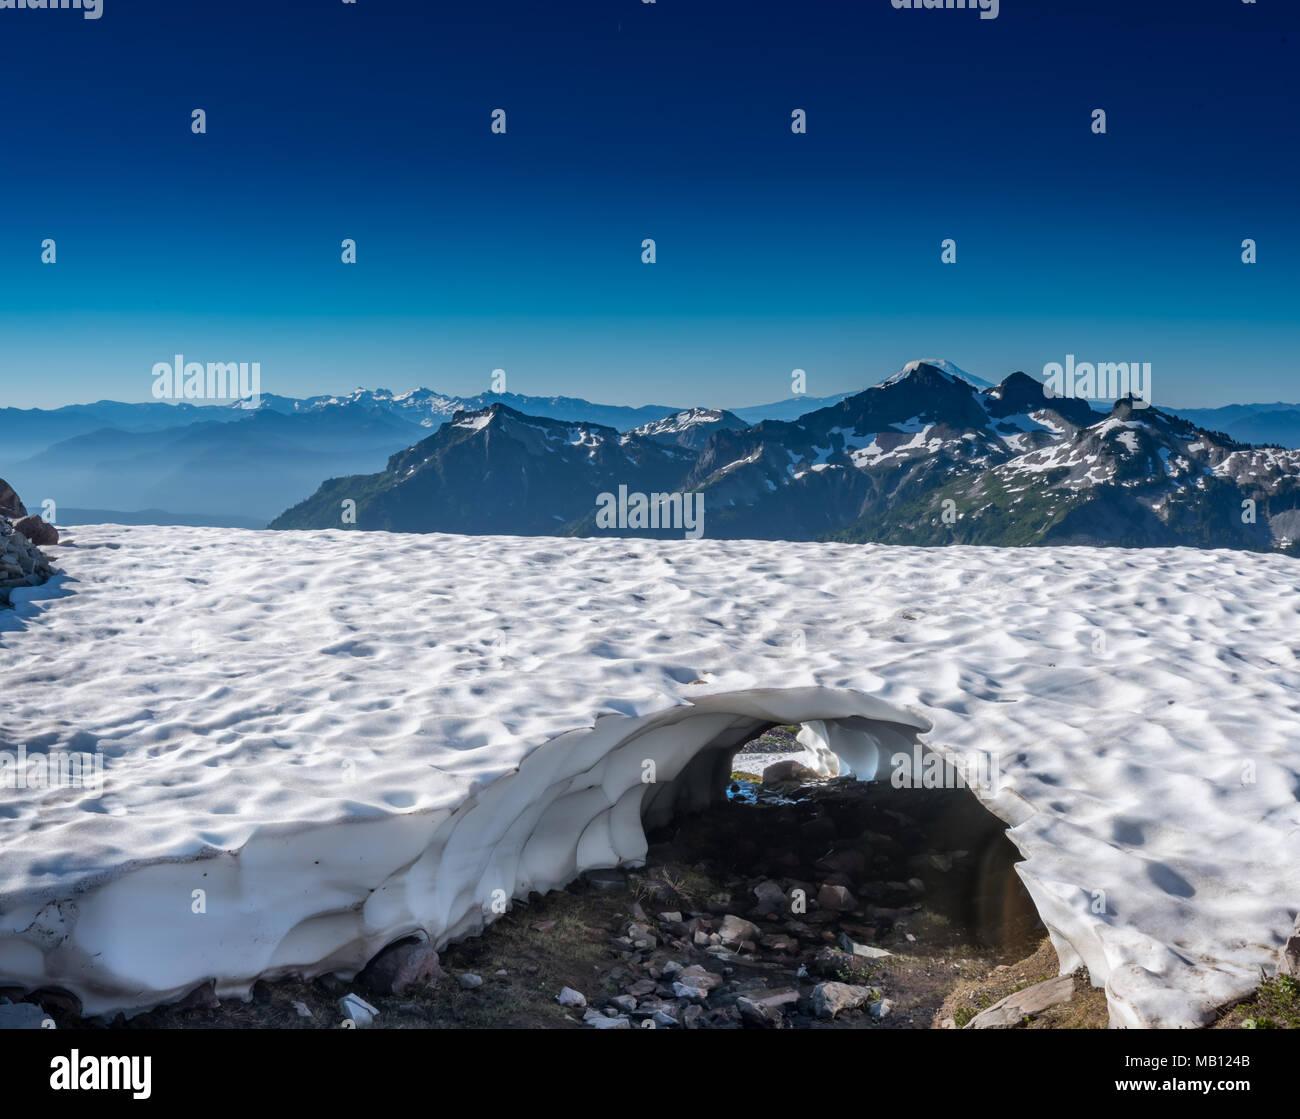 Stream Carves a Tunnel Through Snow Shelf - Stock Image